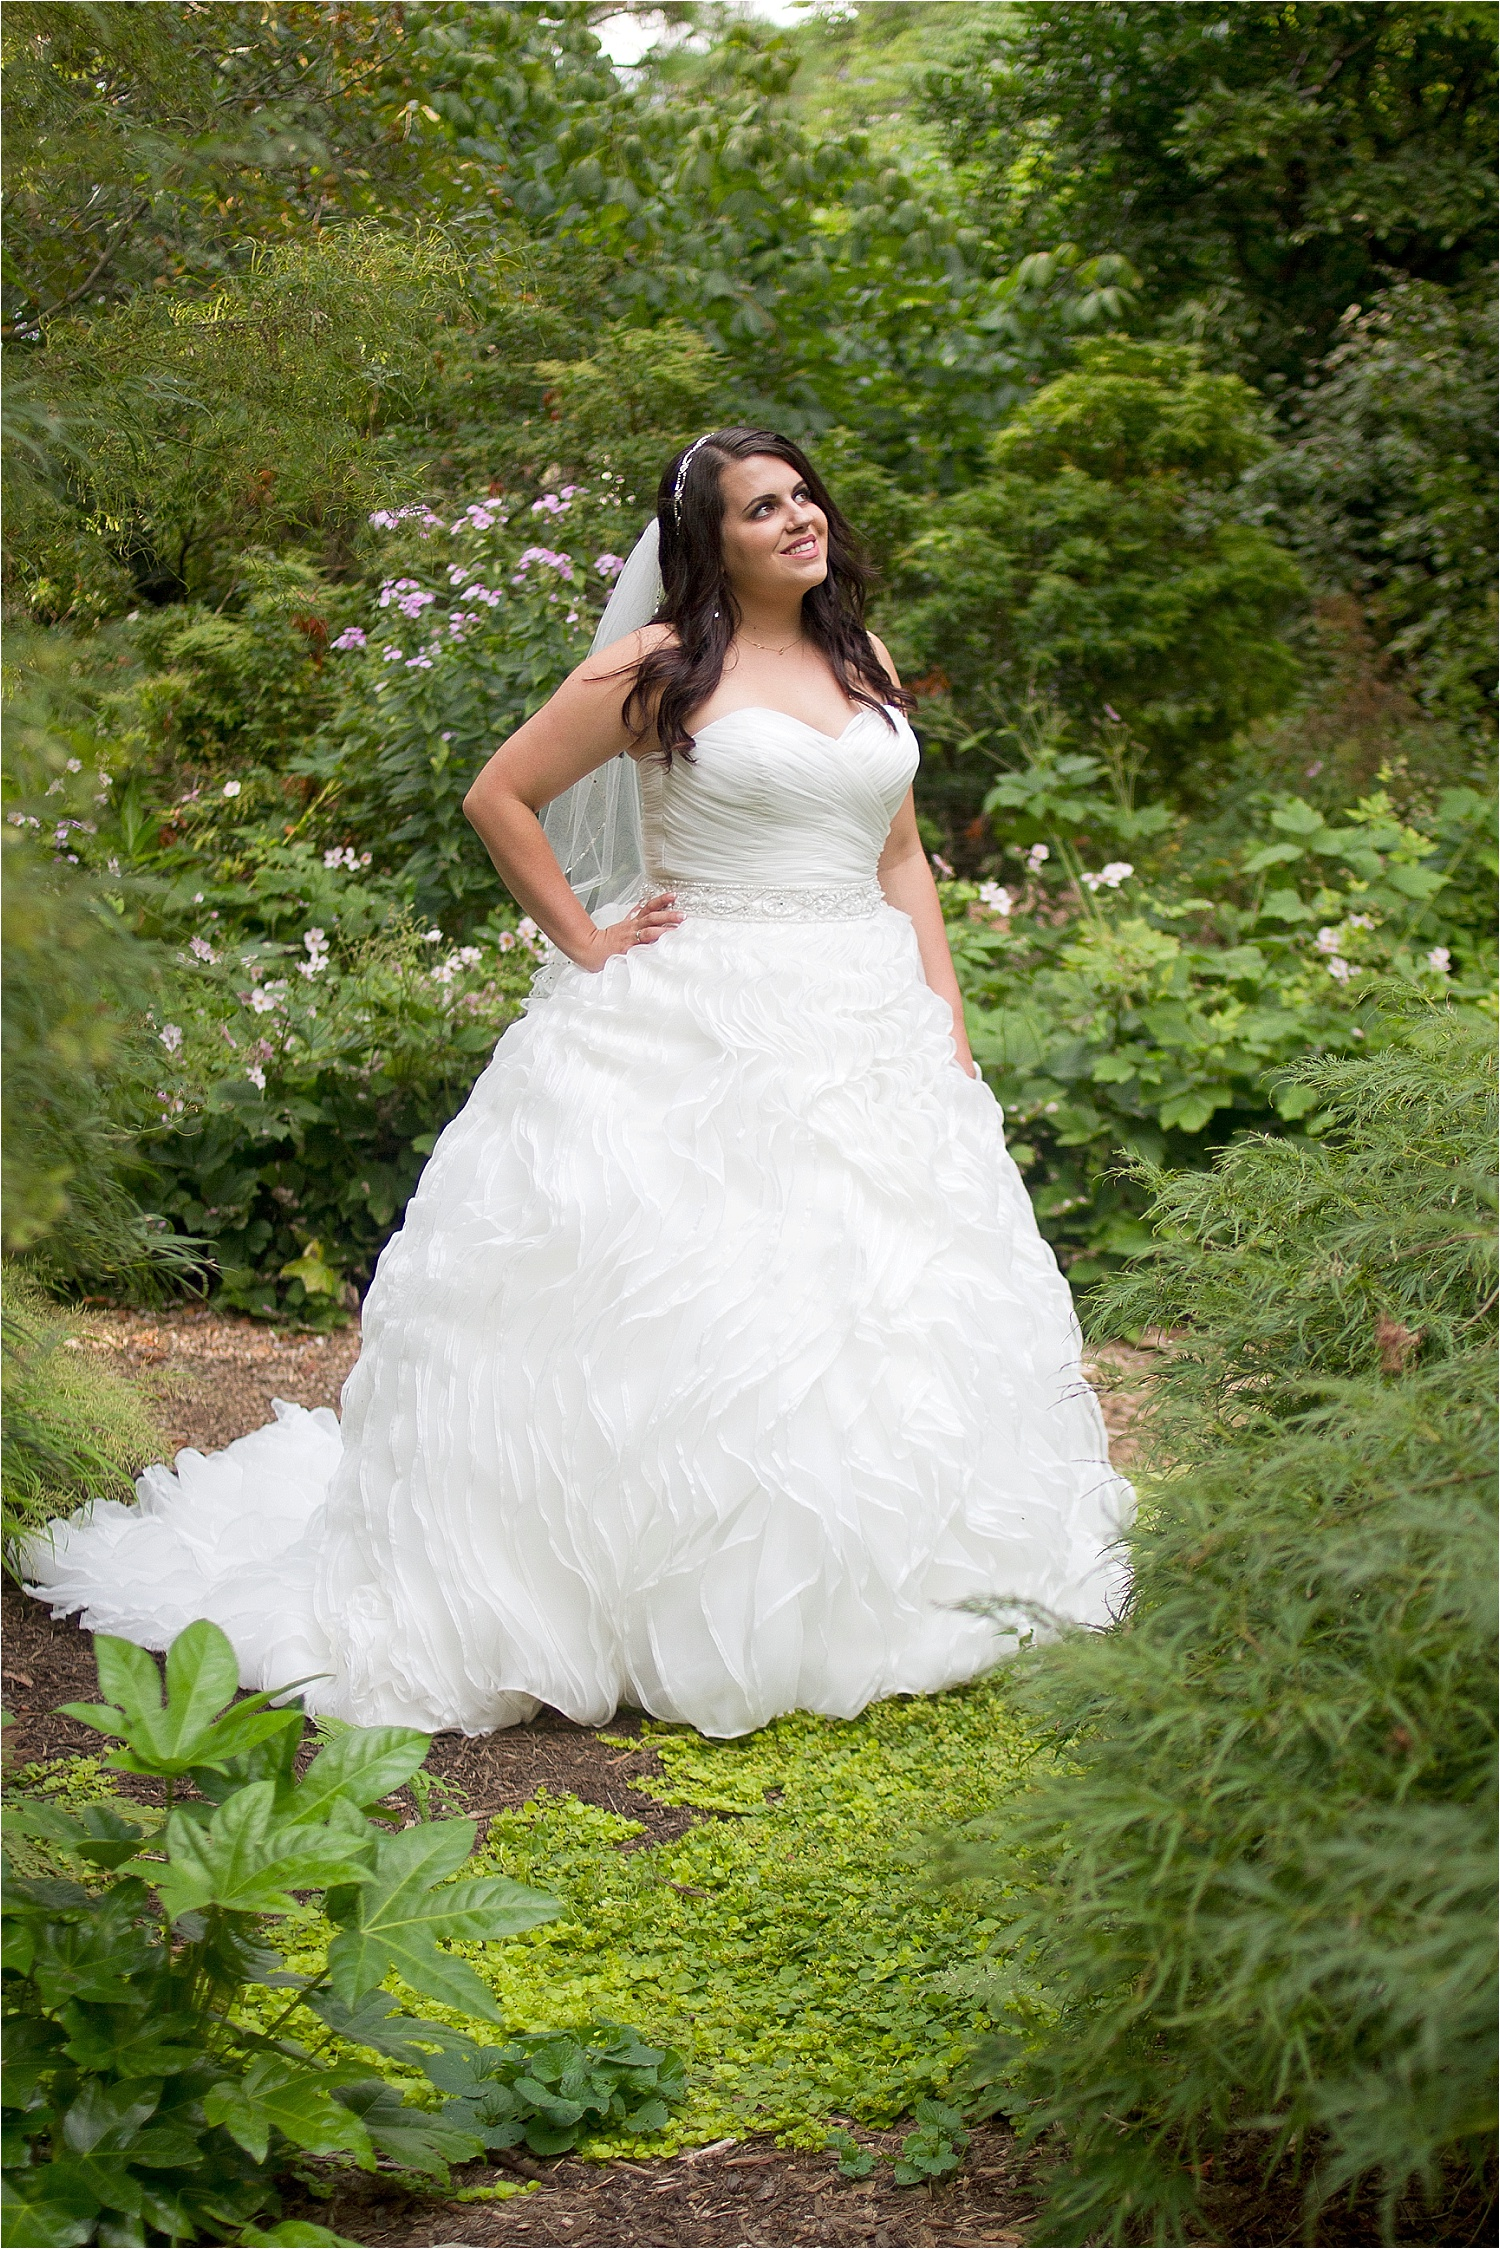 Virginia-Tech-Hahn-Horticulture-Garden-Bridal-Portraits-_0005.jpg